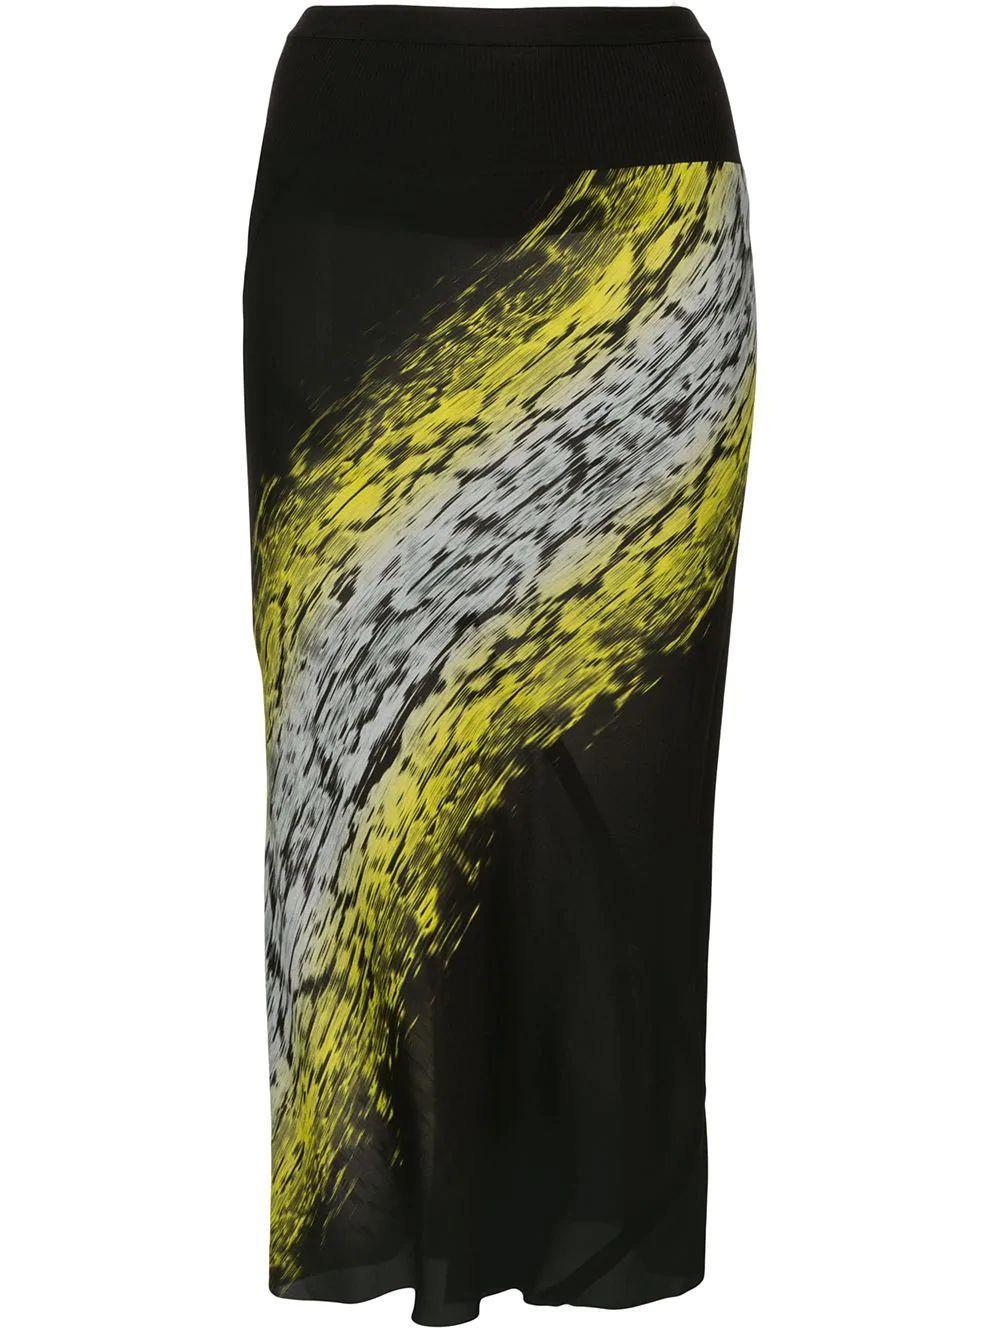 Printed Knee Length Skirt Item # RP20F2332